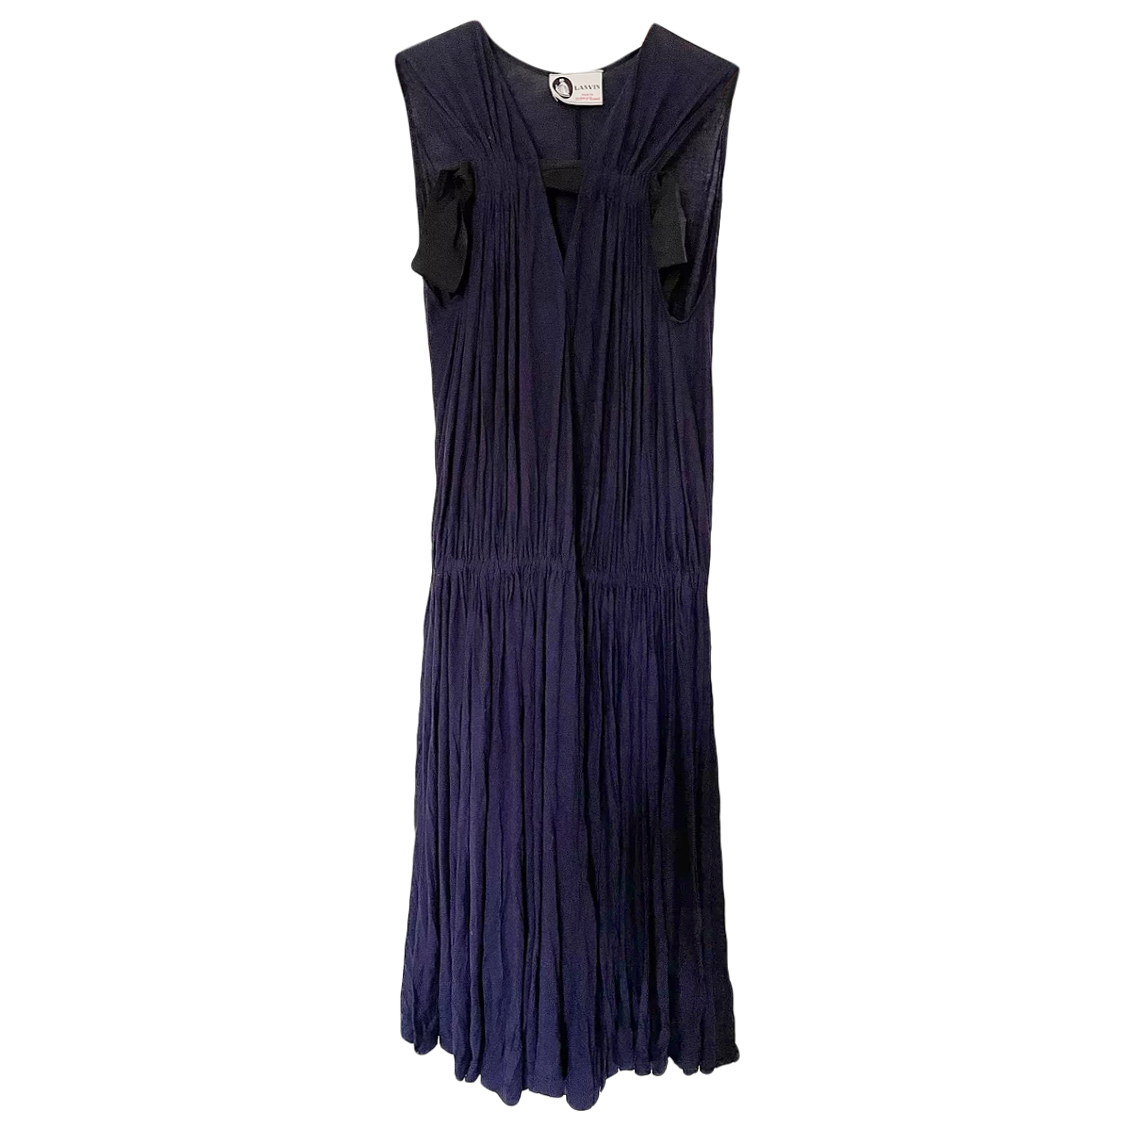 Lanvin Navy Blue Pleated jersey Sleeveless Dress